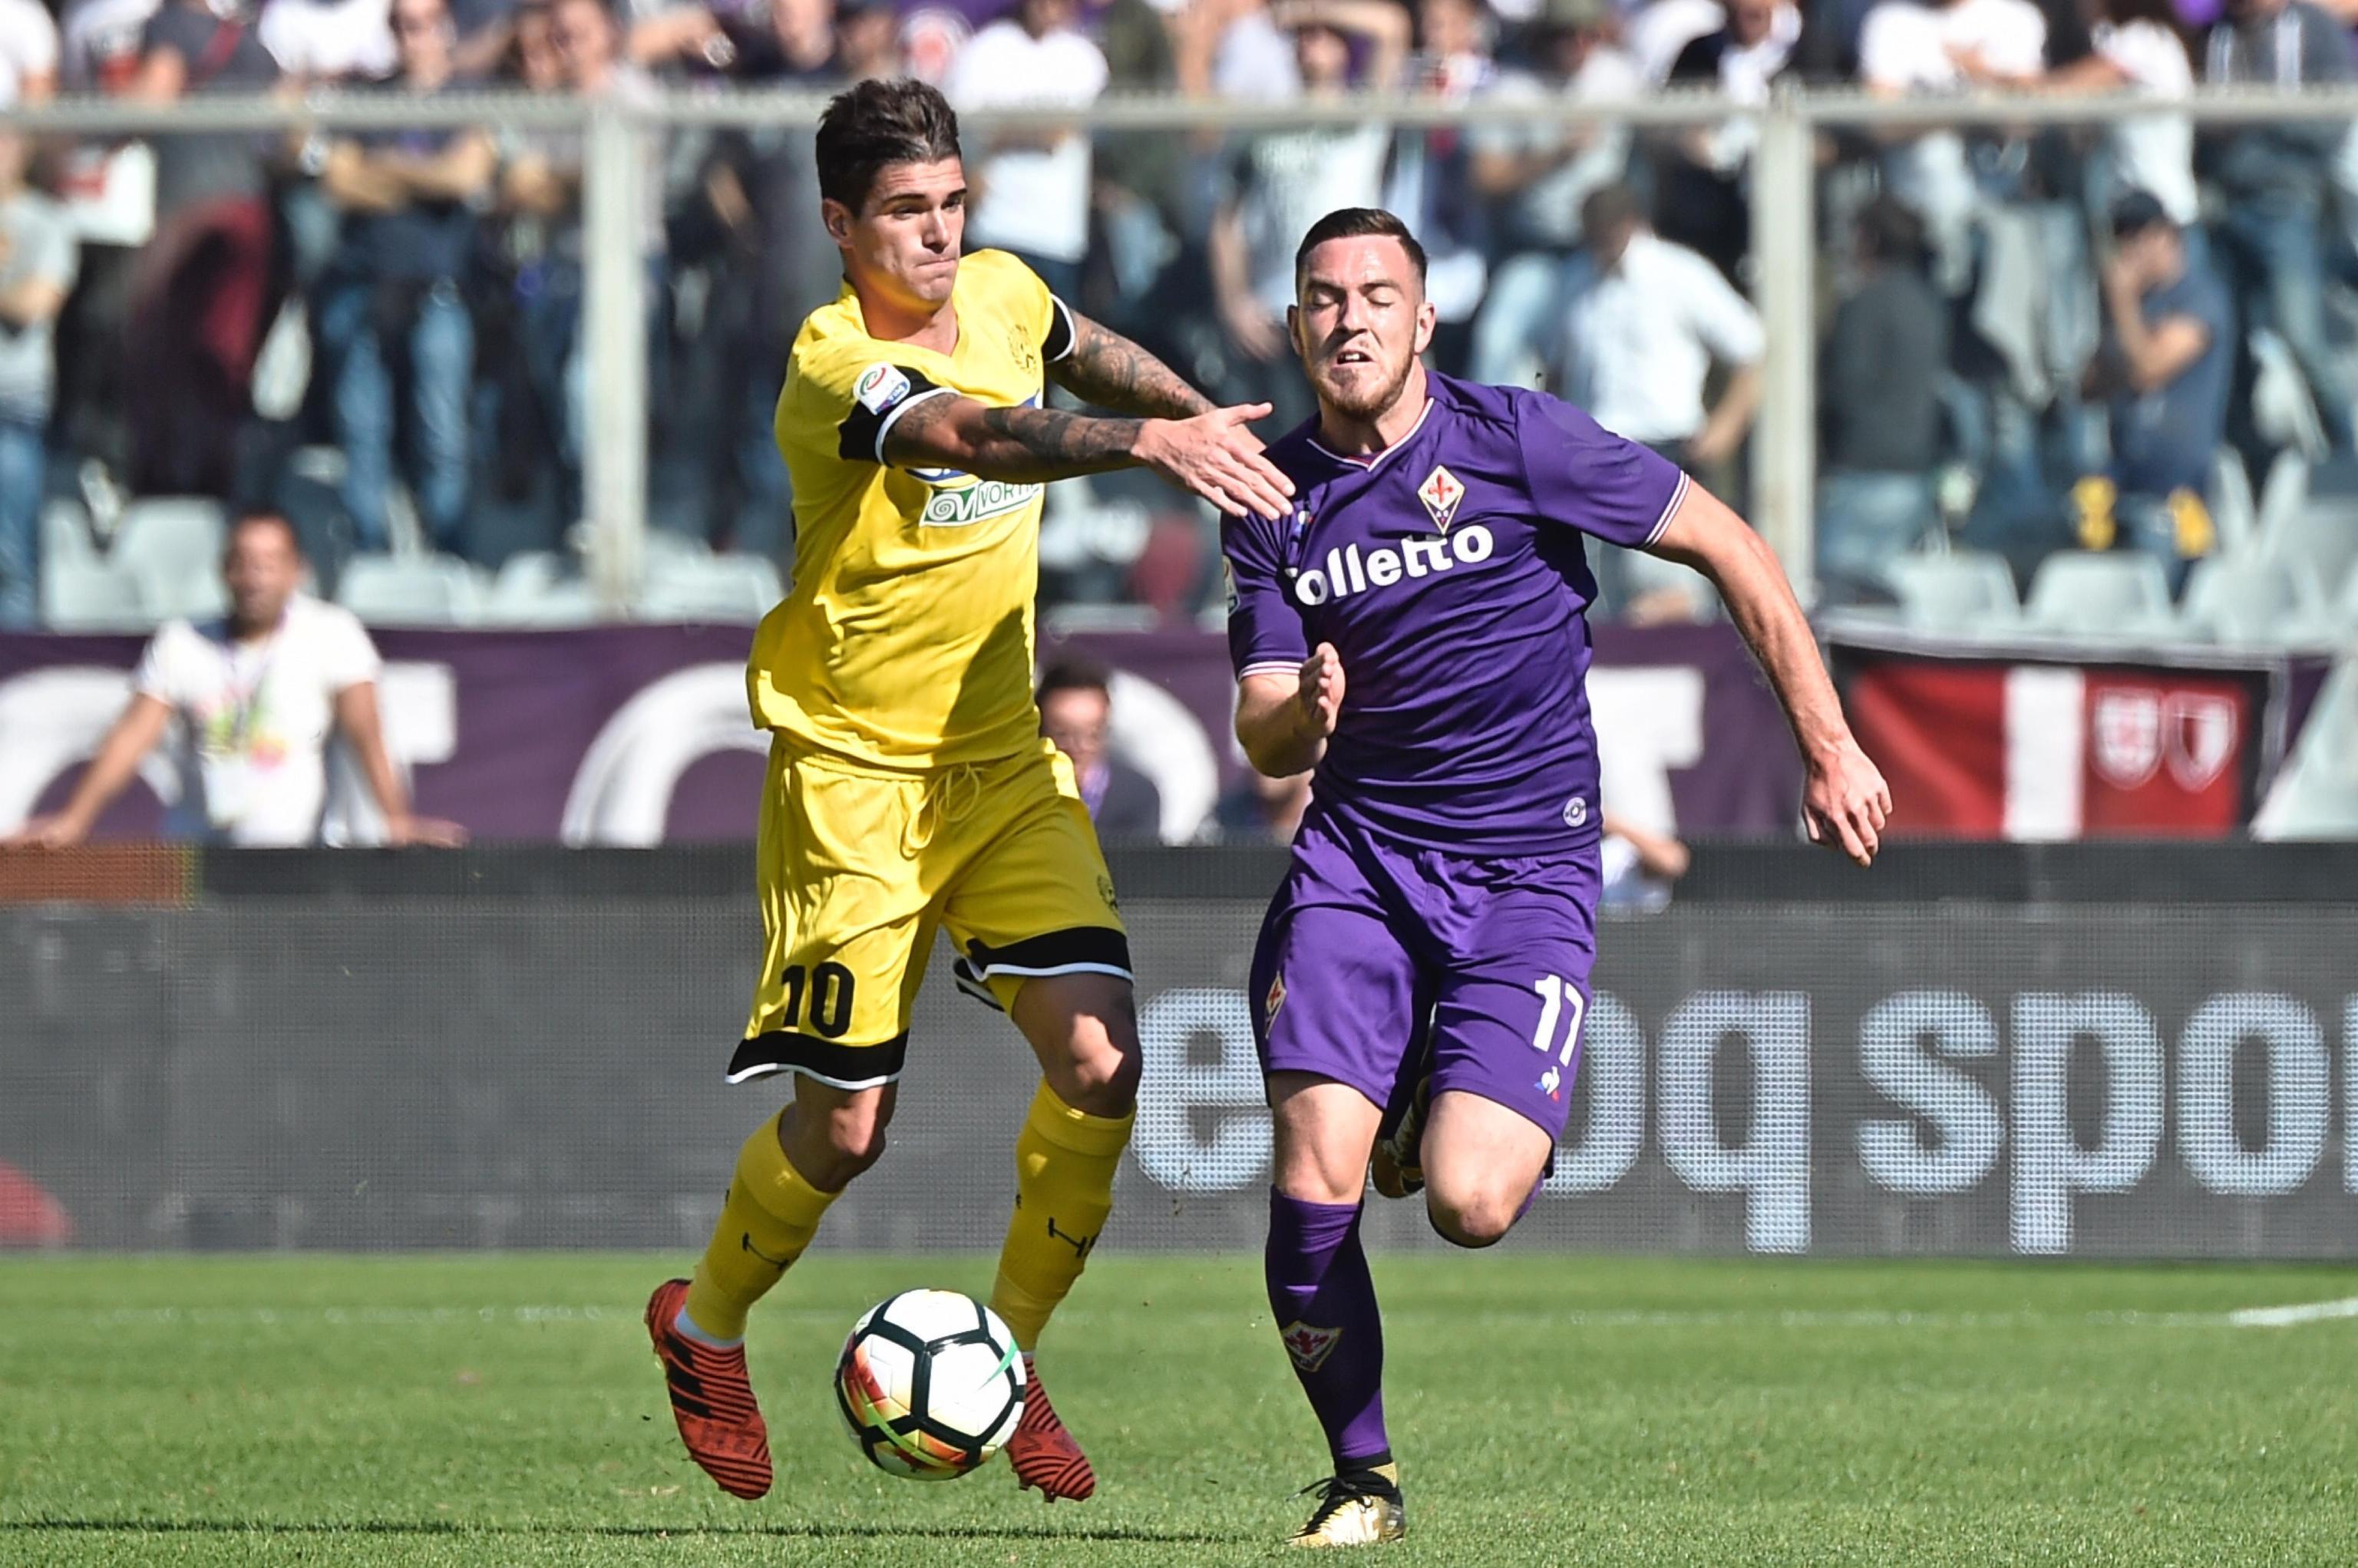 Fiorentina-Udinese 2-1: decide Thereau